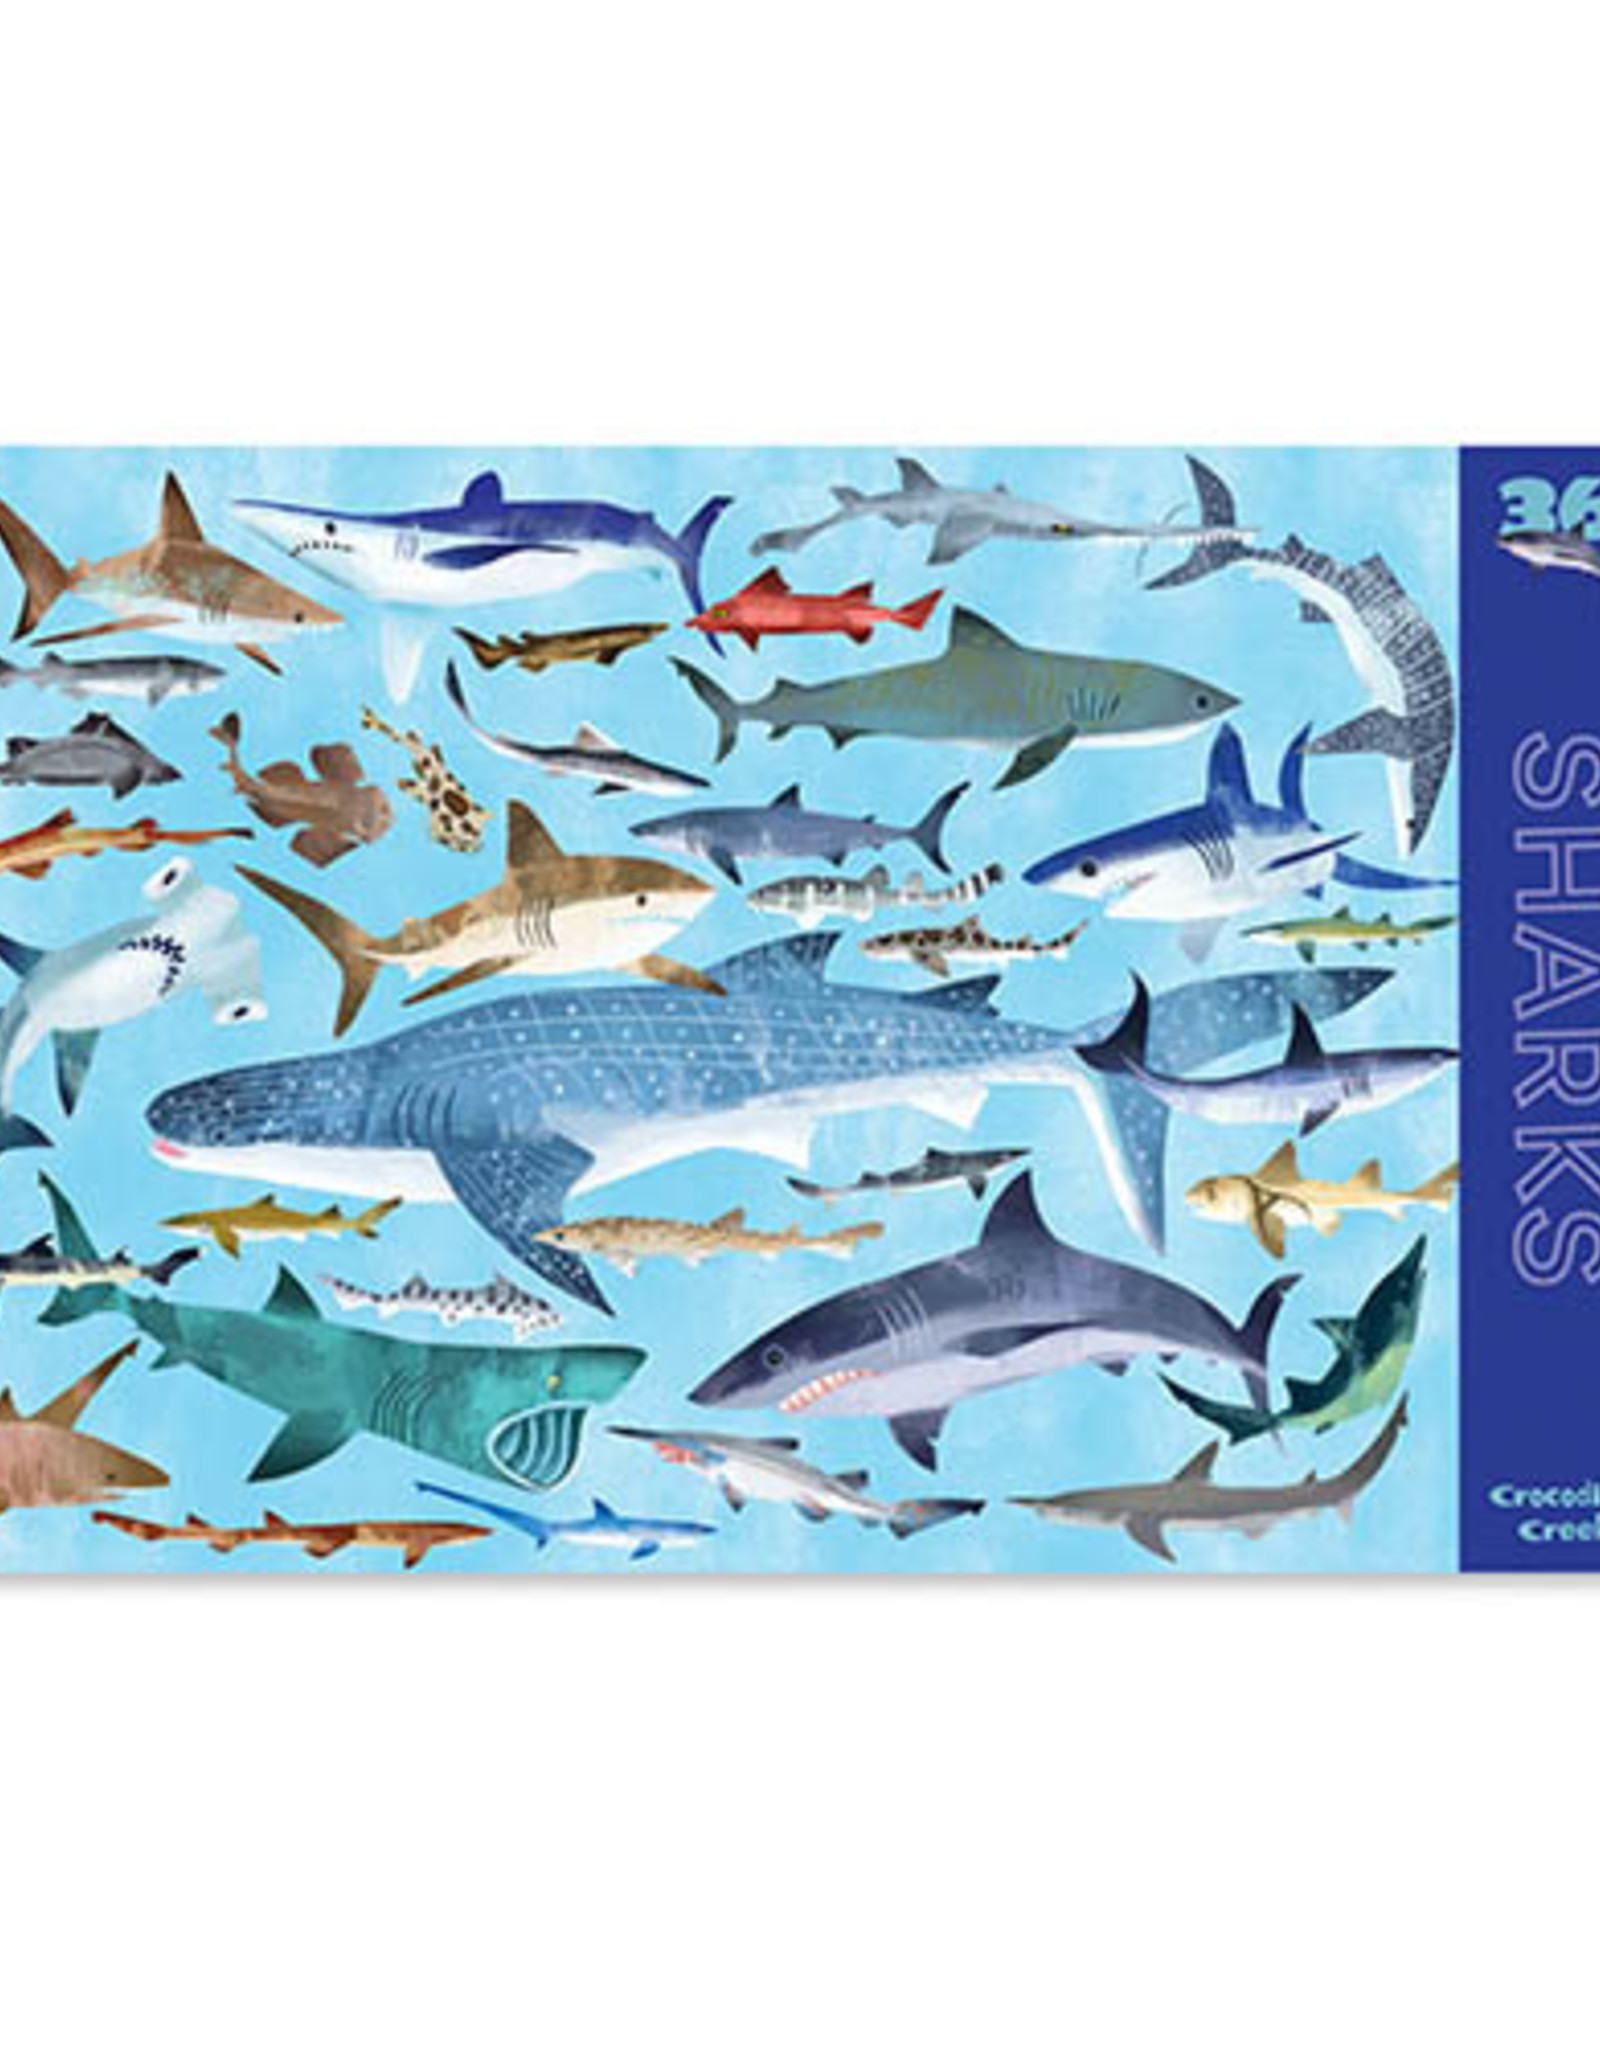 Crocodile Creek Placemat 36 Sharks